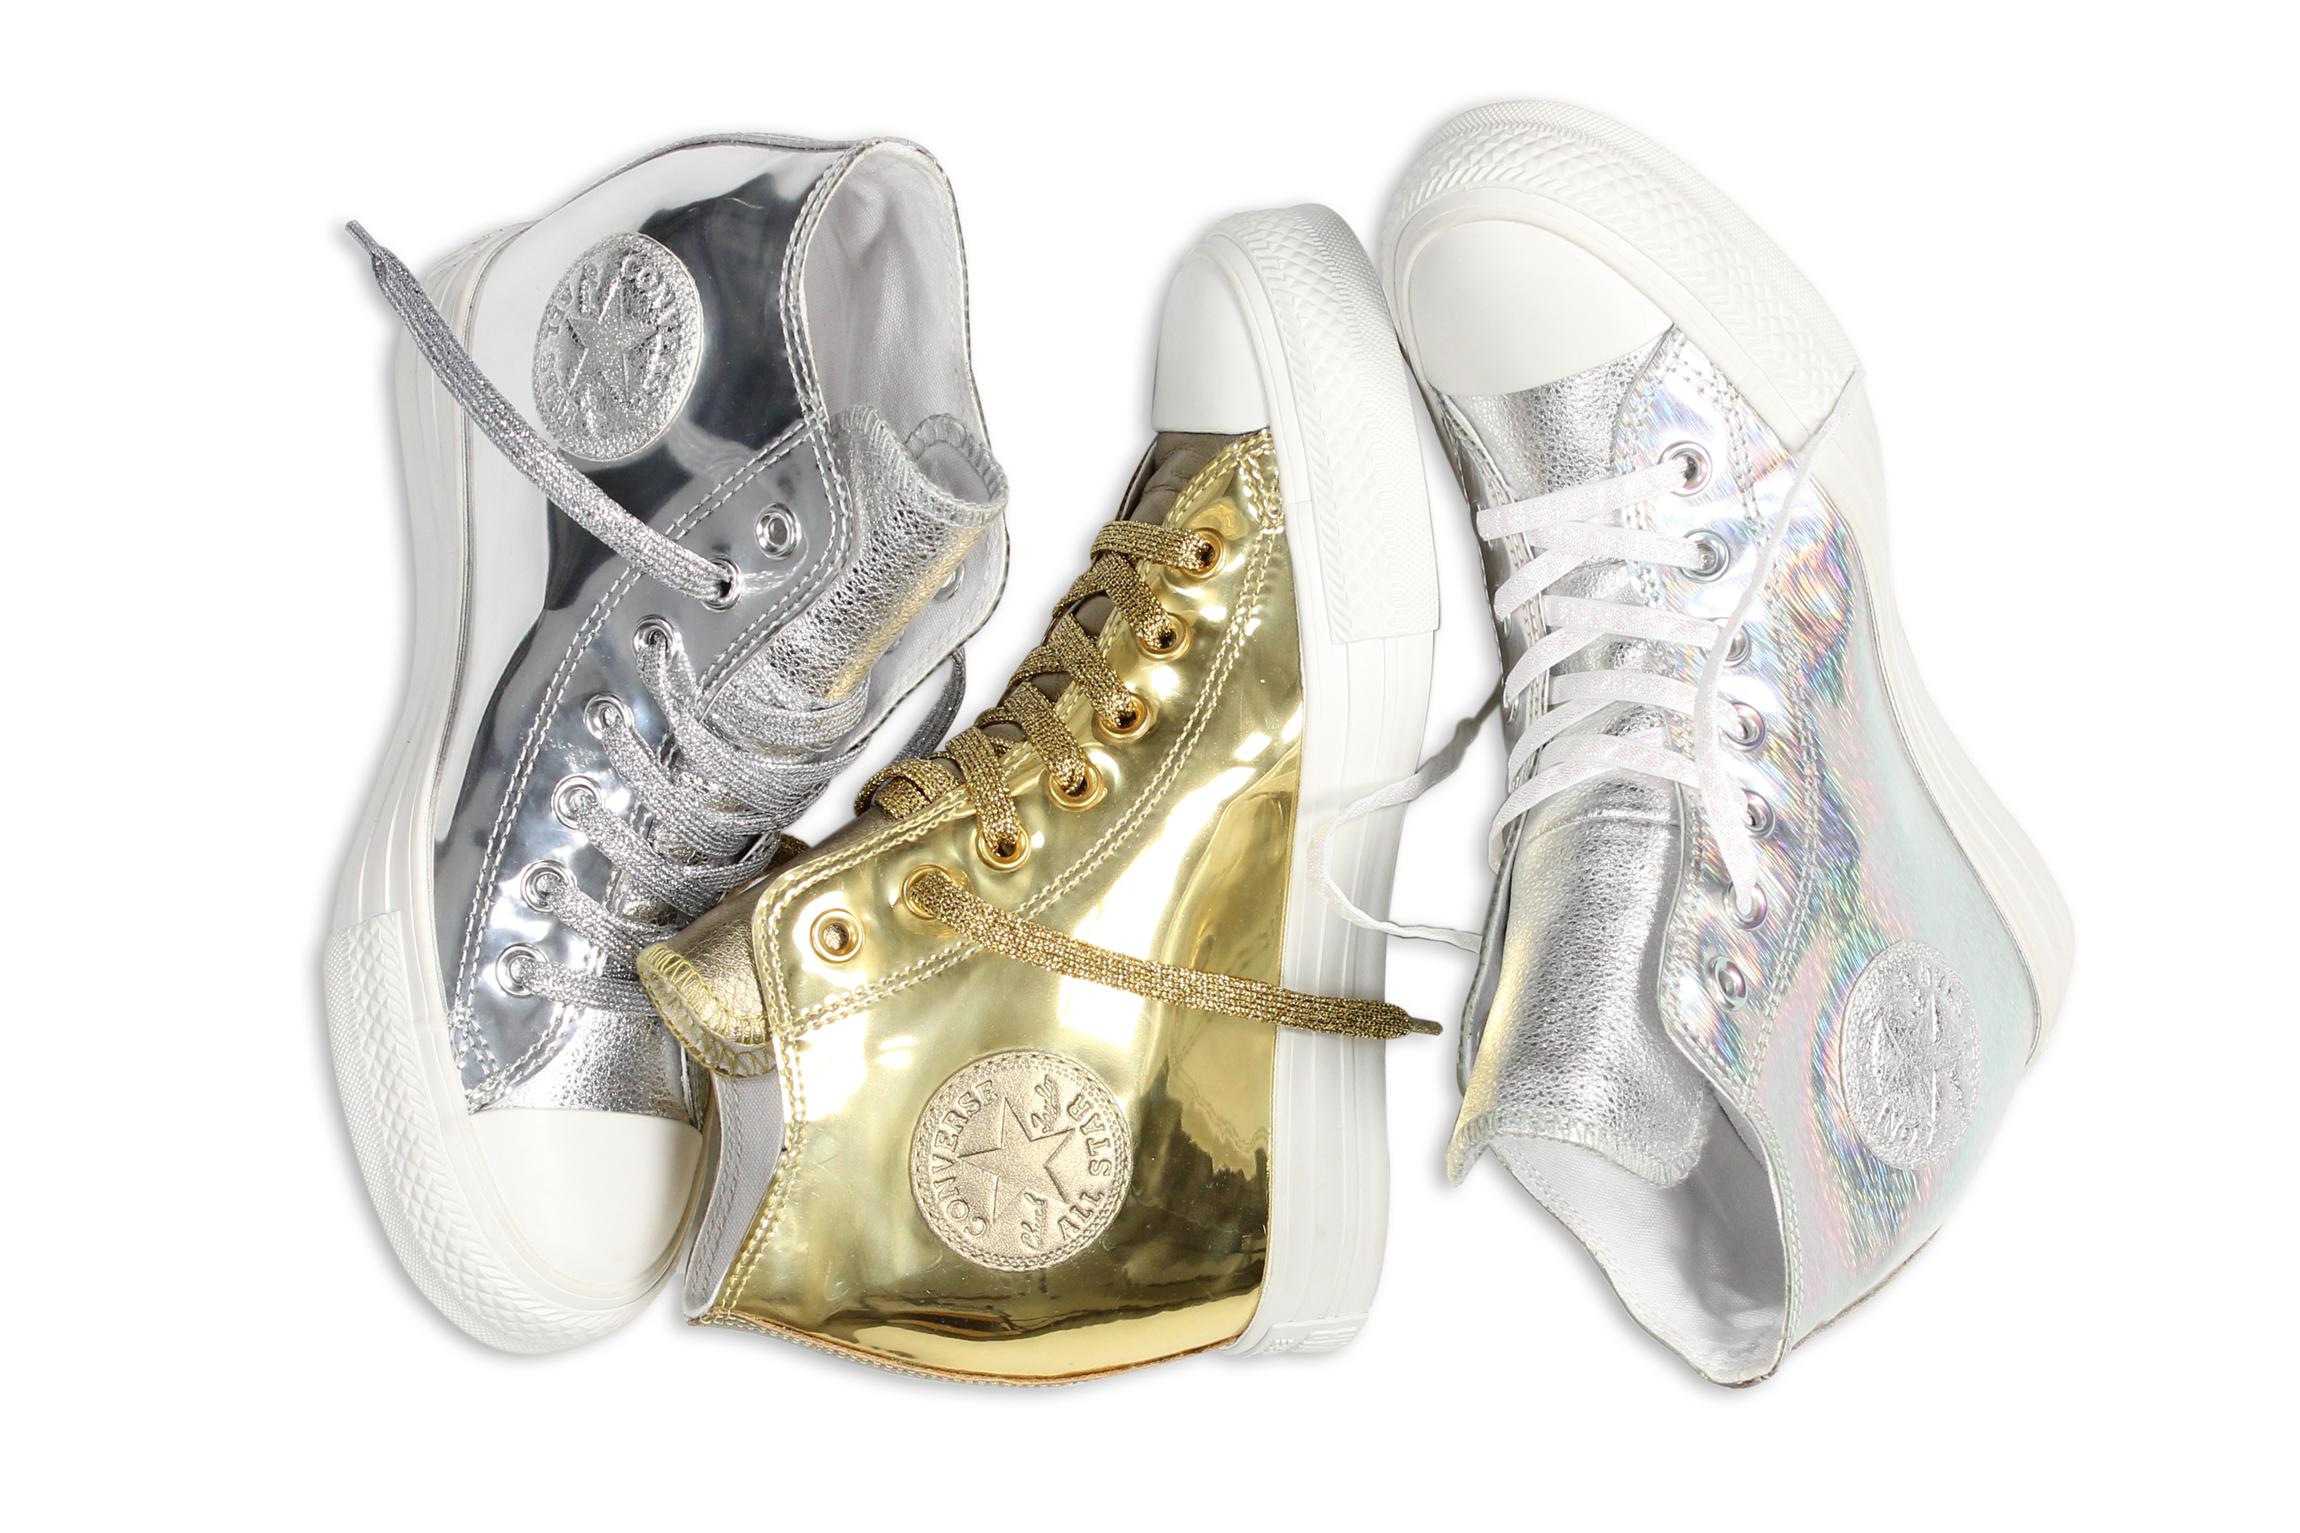 Converse Chuck Taylor All Star Metallic Lux Collection – SCENEZINE